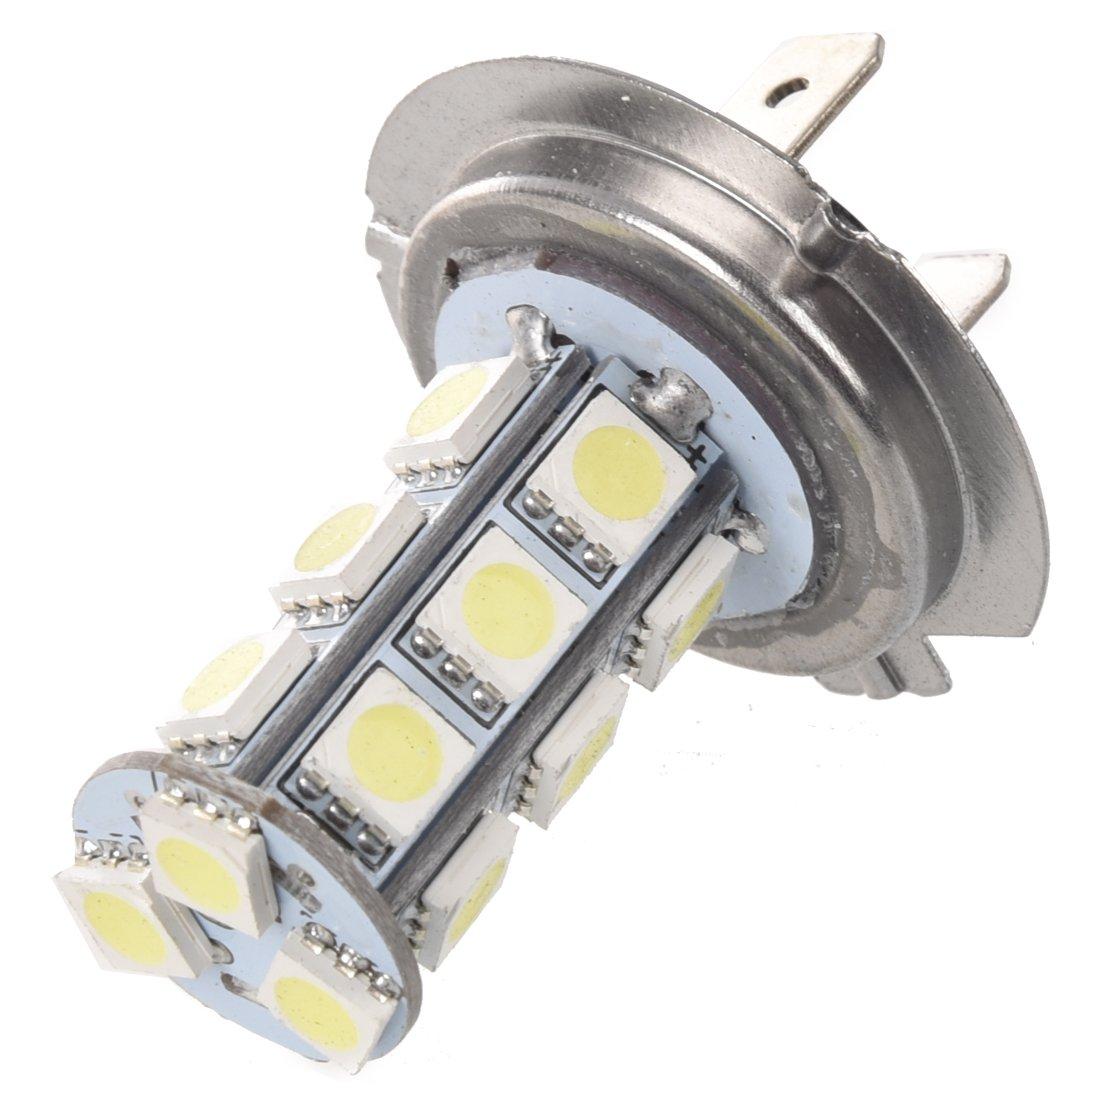 SODIAL (R)2 X Car Vehicle H7 18 SMD LED Xenon White Light Bulbs Lamp SODIAL(R) 012116